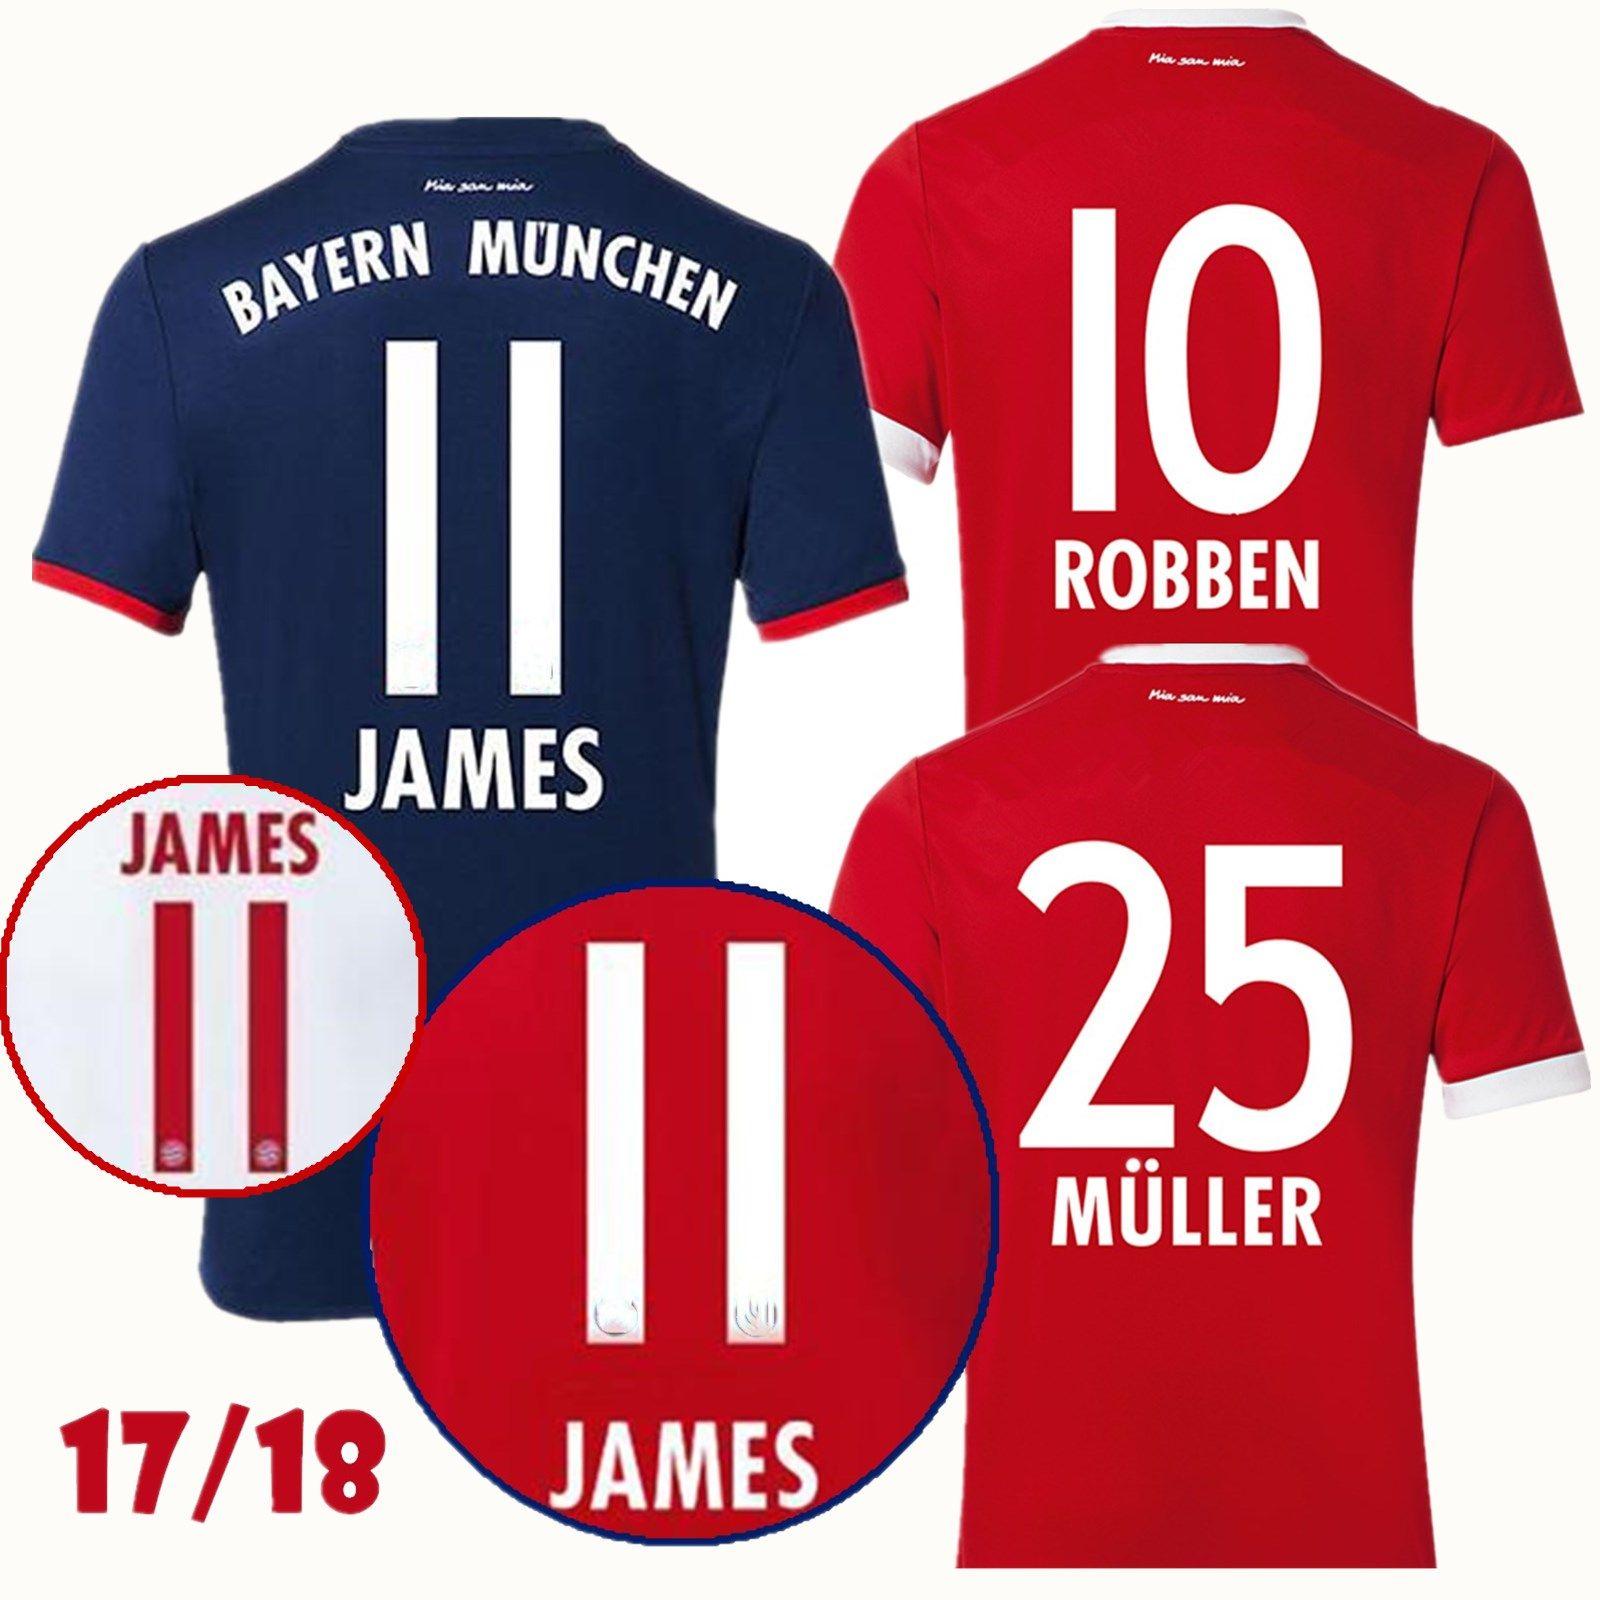 821fb5137 ... 2017 2018 Rodriguez 11 James Soccer Jerseys Home Away Third Kit Jersey  Ribery Robben VIDAL LEWANDOWSKI .